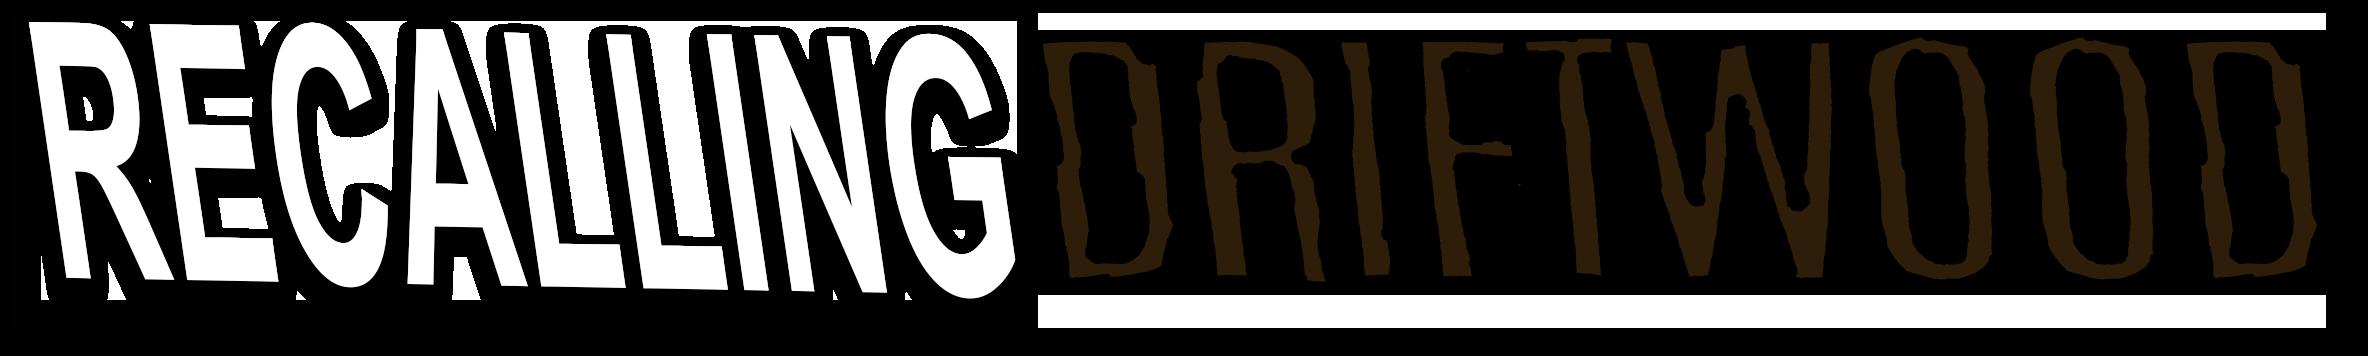 Recalling Driftwood